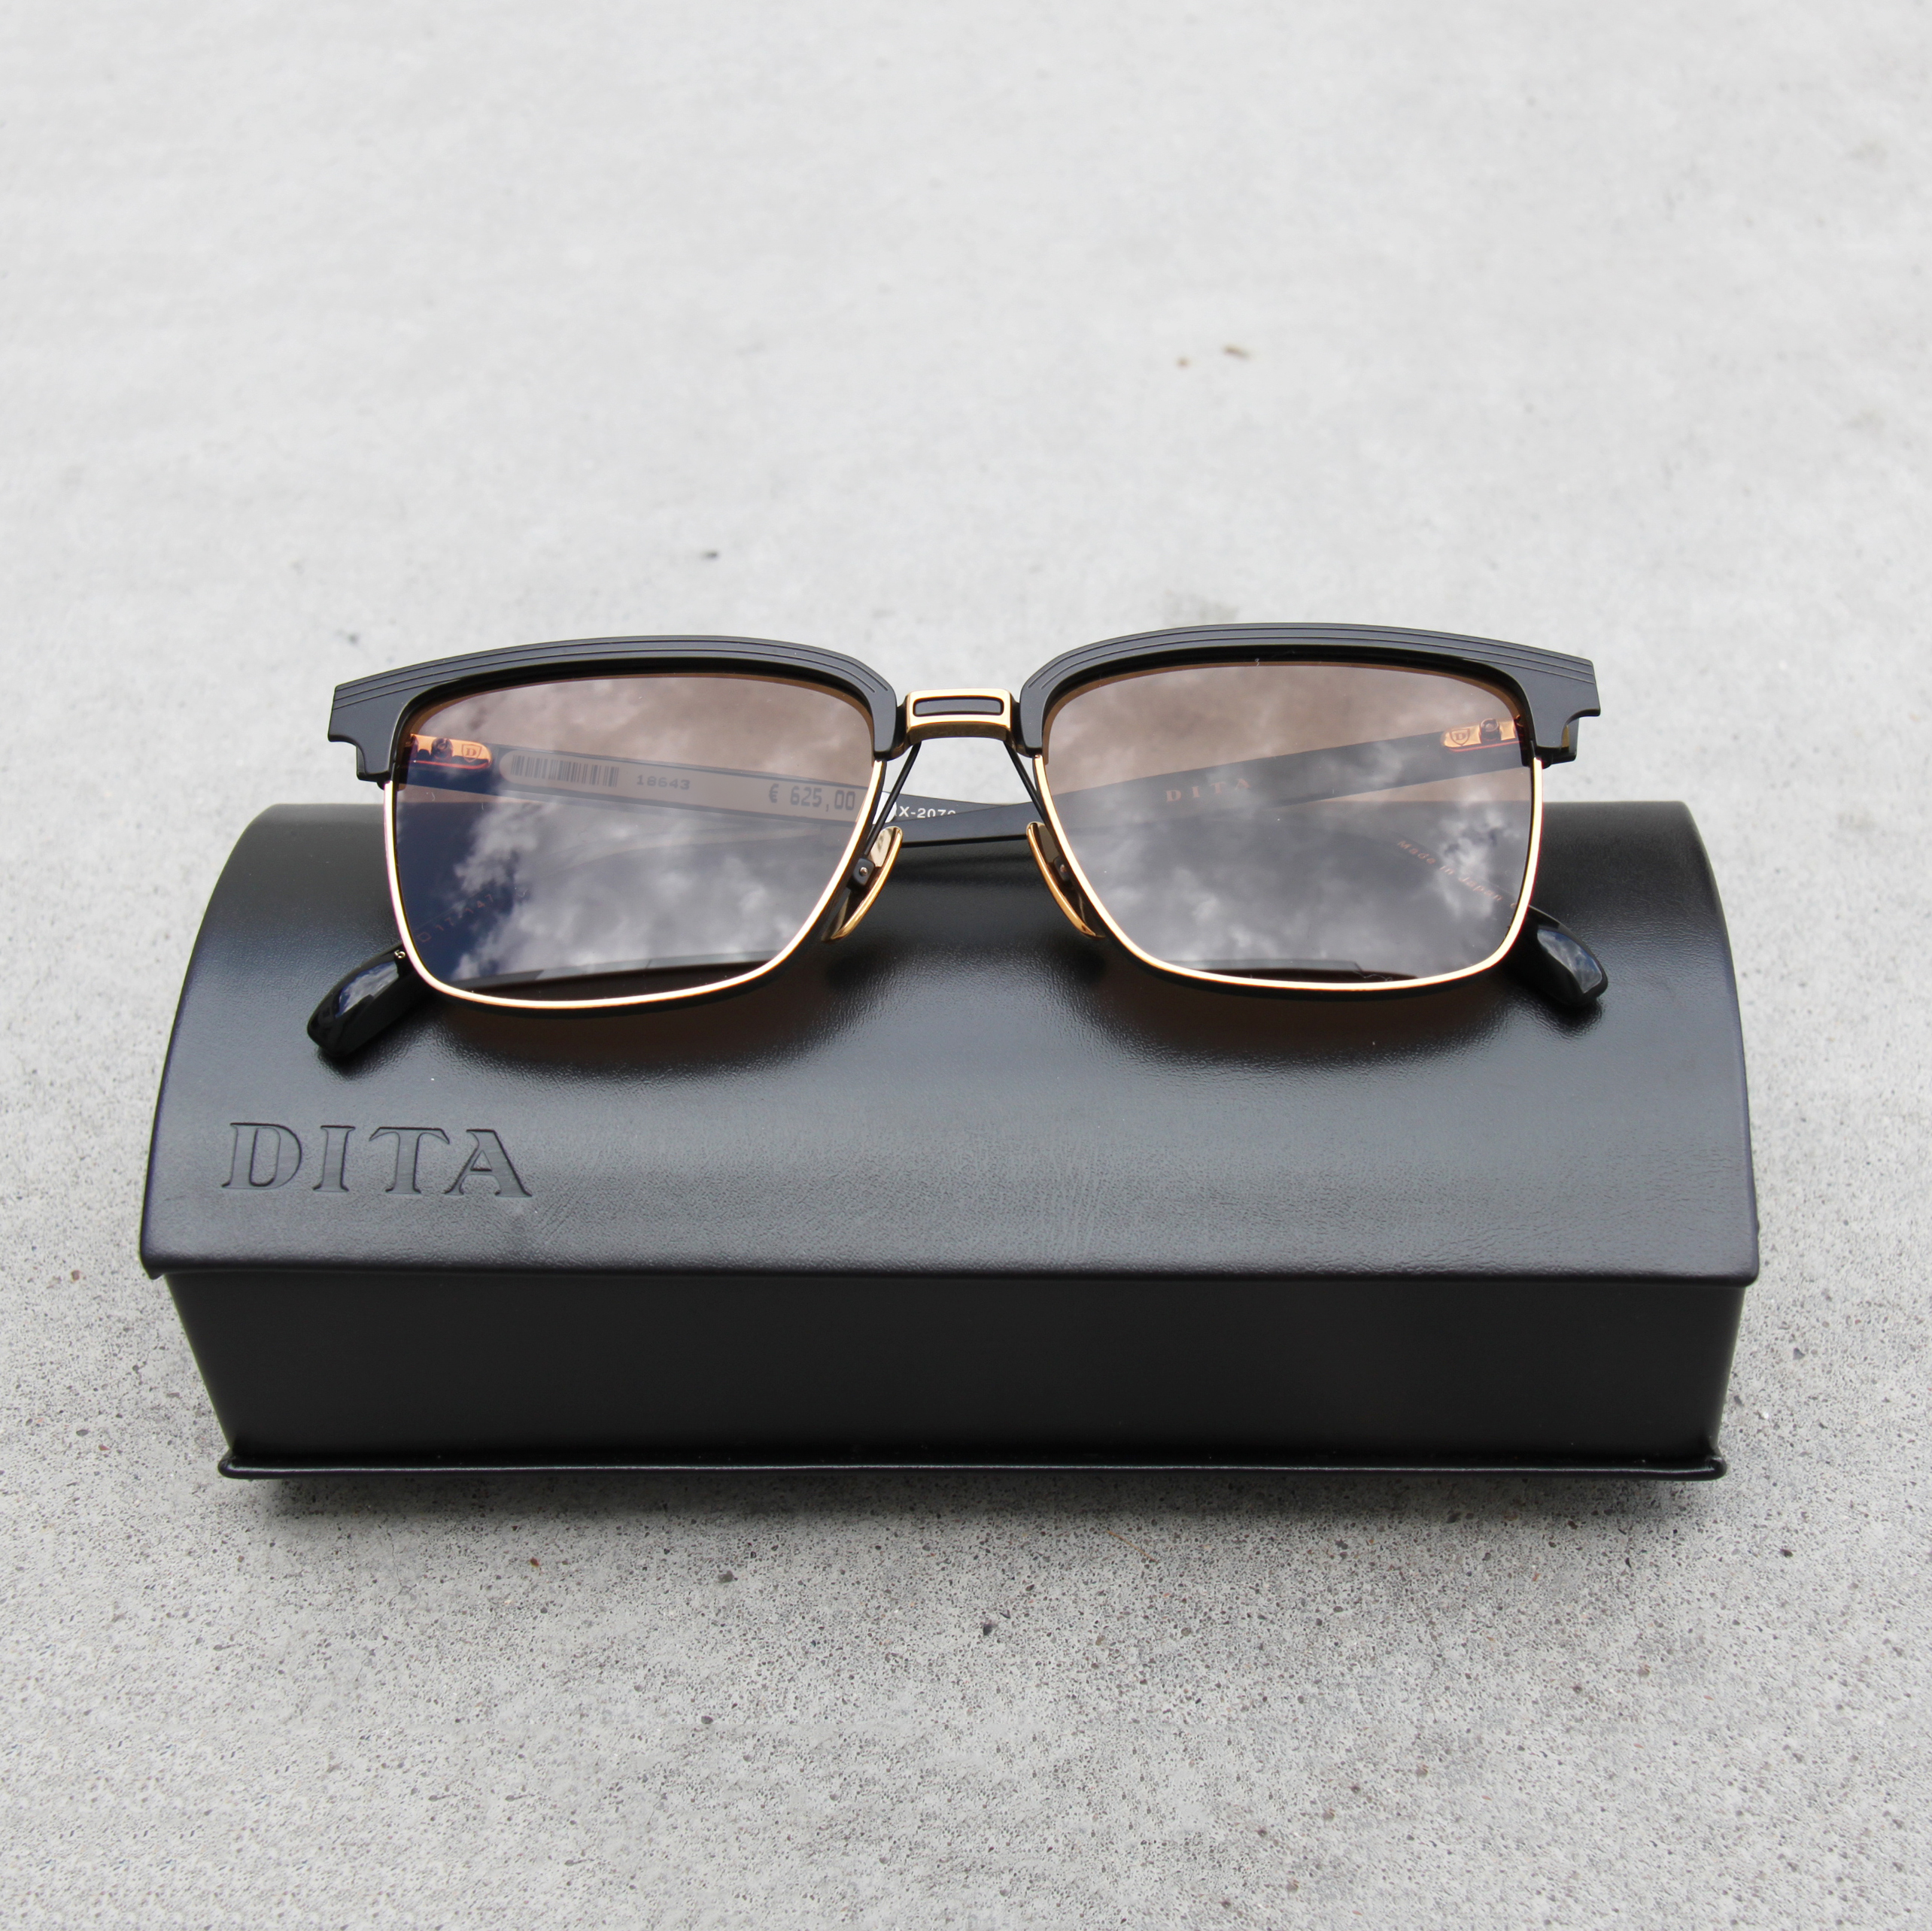 dbc73d23f00d39 Shop DITA Mach One zonnebrillen - optiek Lammerant